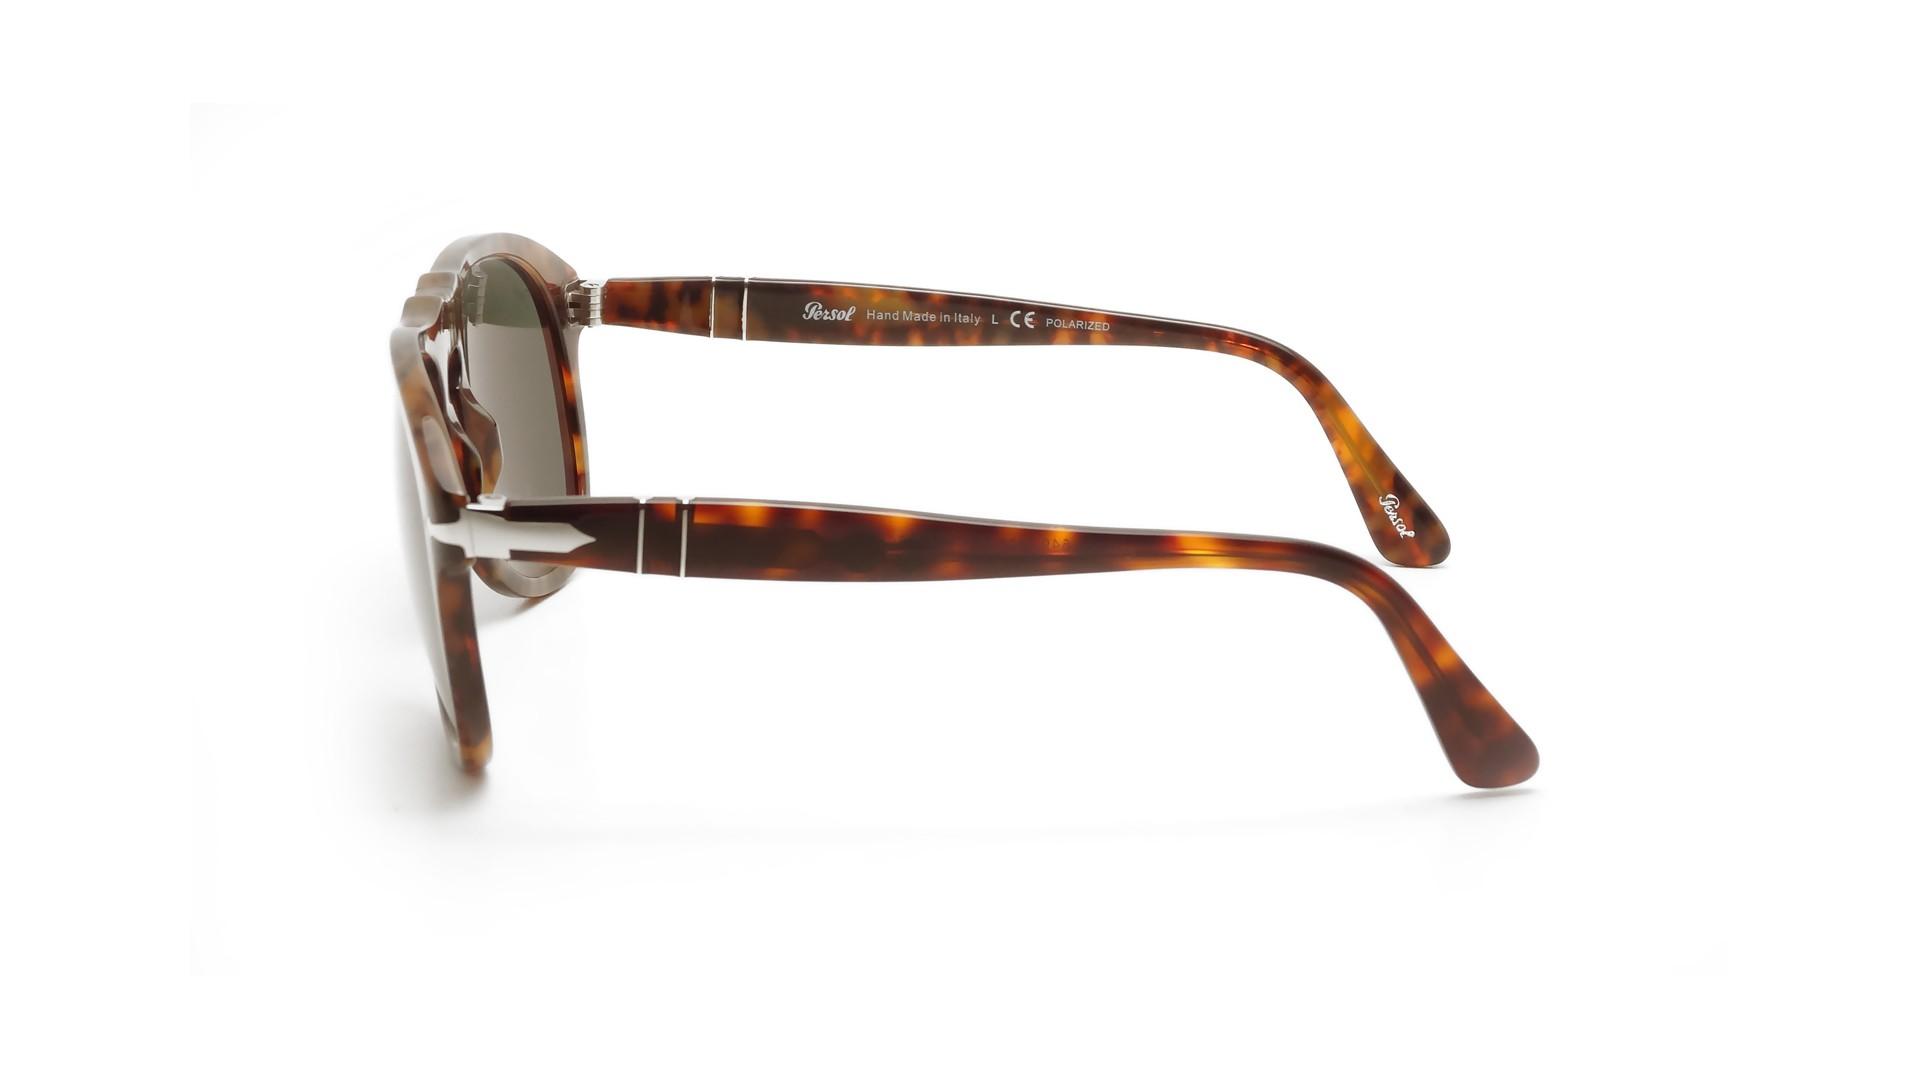 The Best Polarized Sunglasses